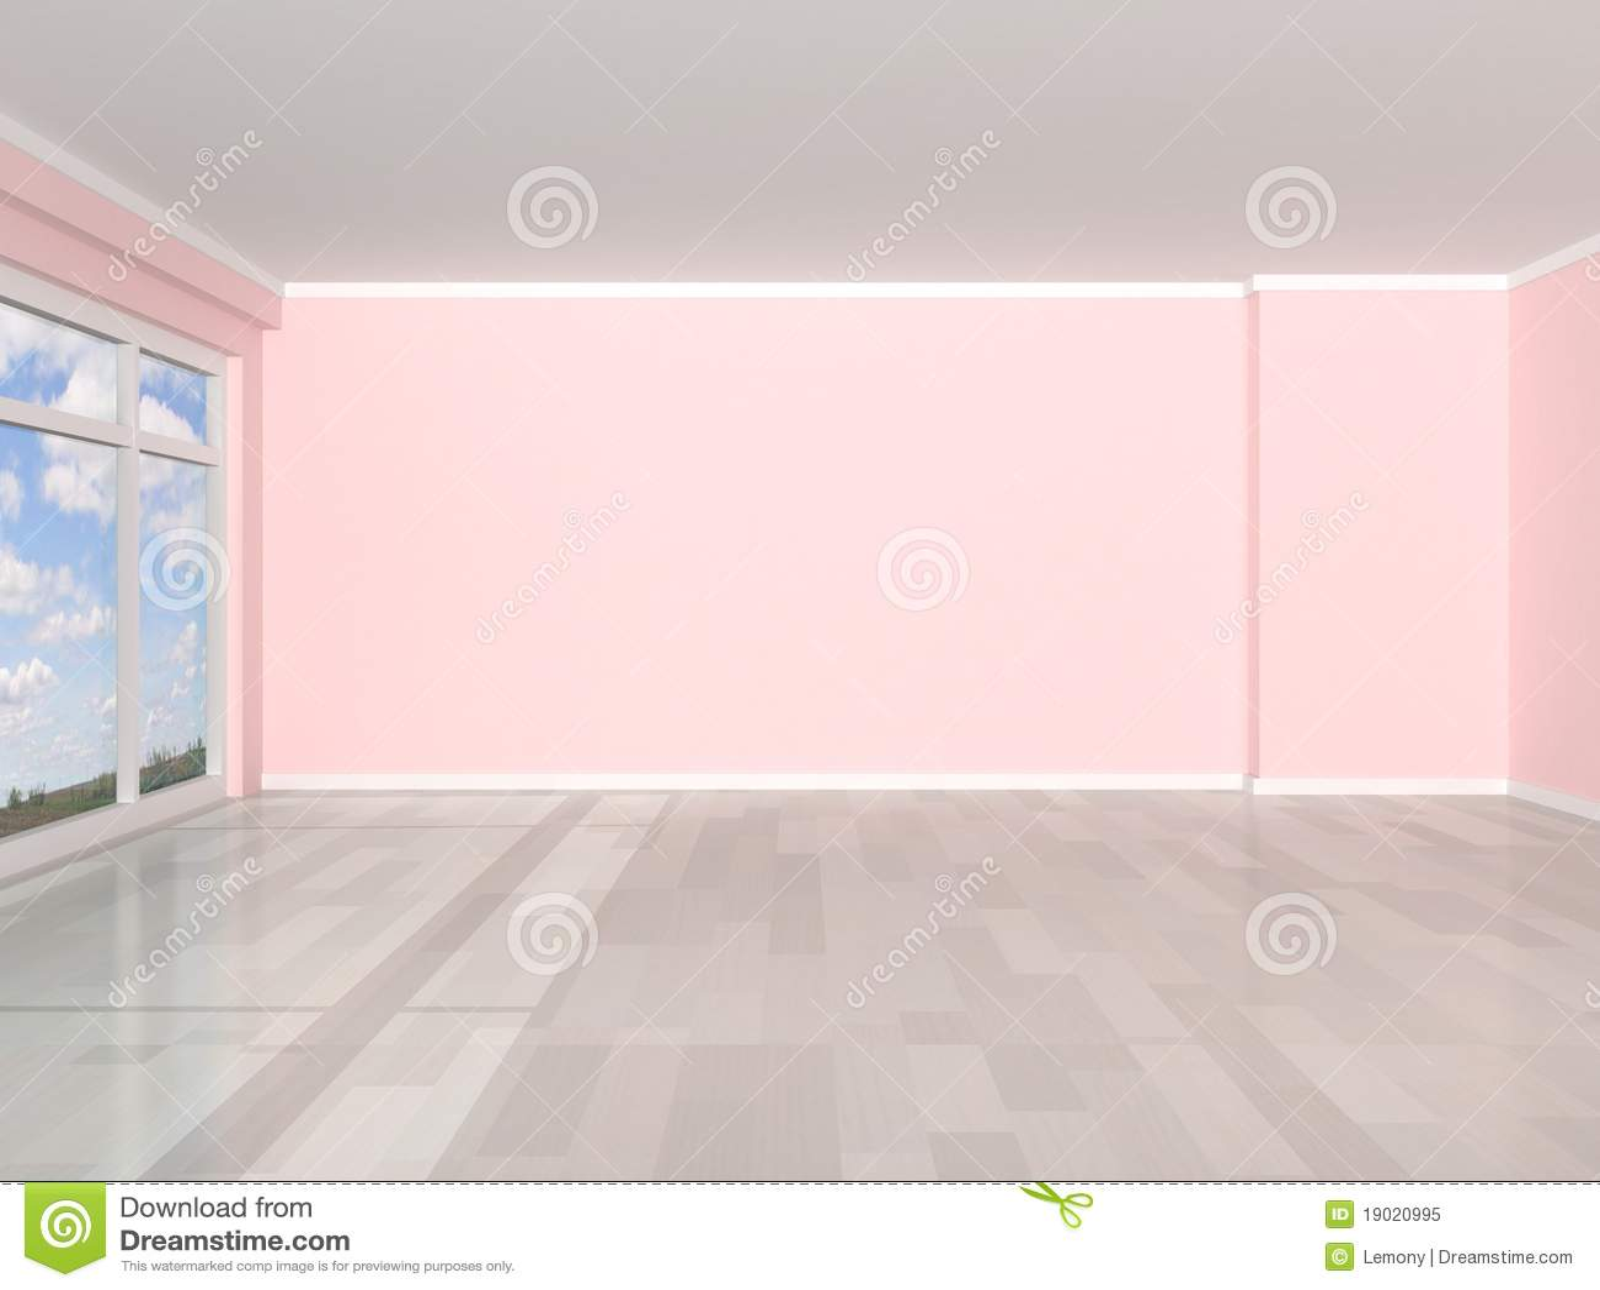 3d das den leeren raum bertr gt lizenzfreies stockfoto bild 19020995. Black Bedroom Furniture Sets. Home Design Ideas